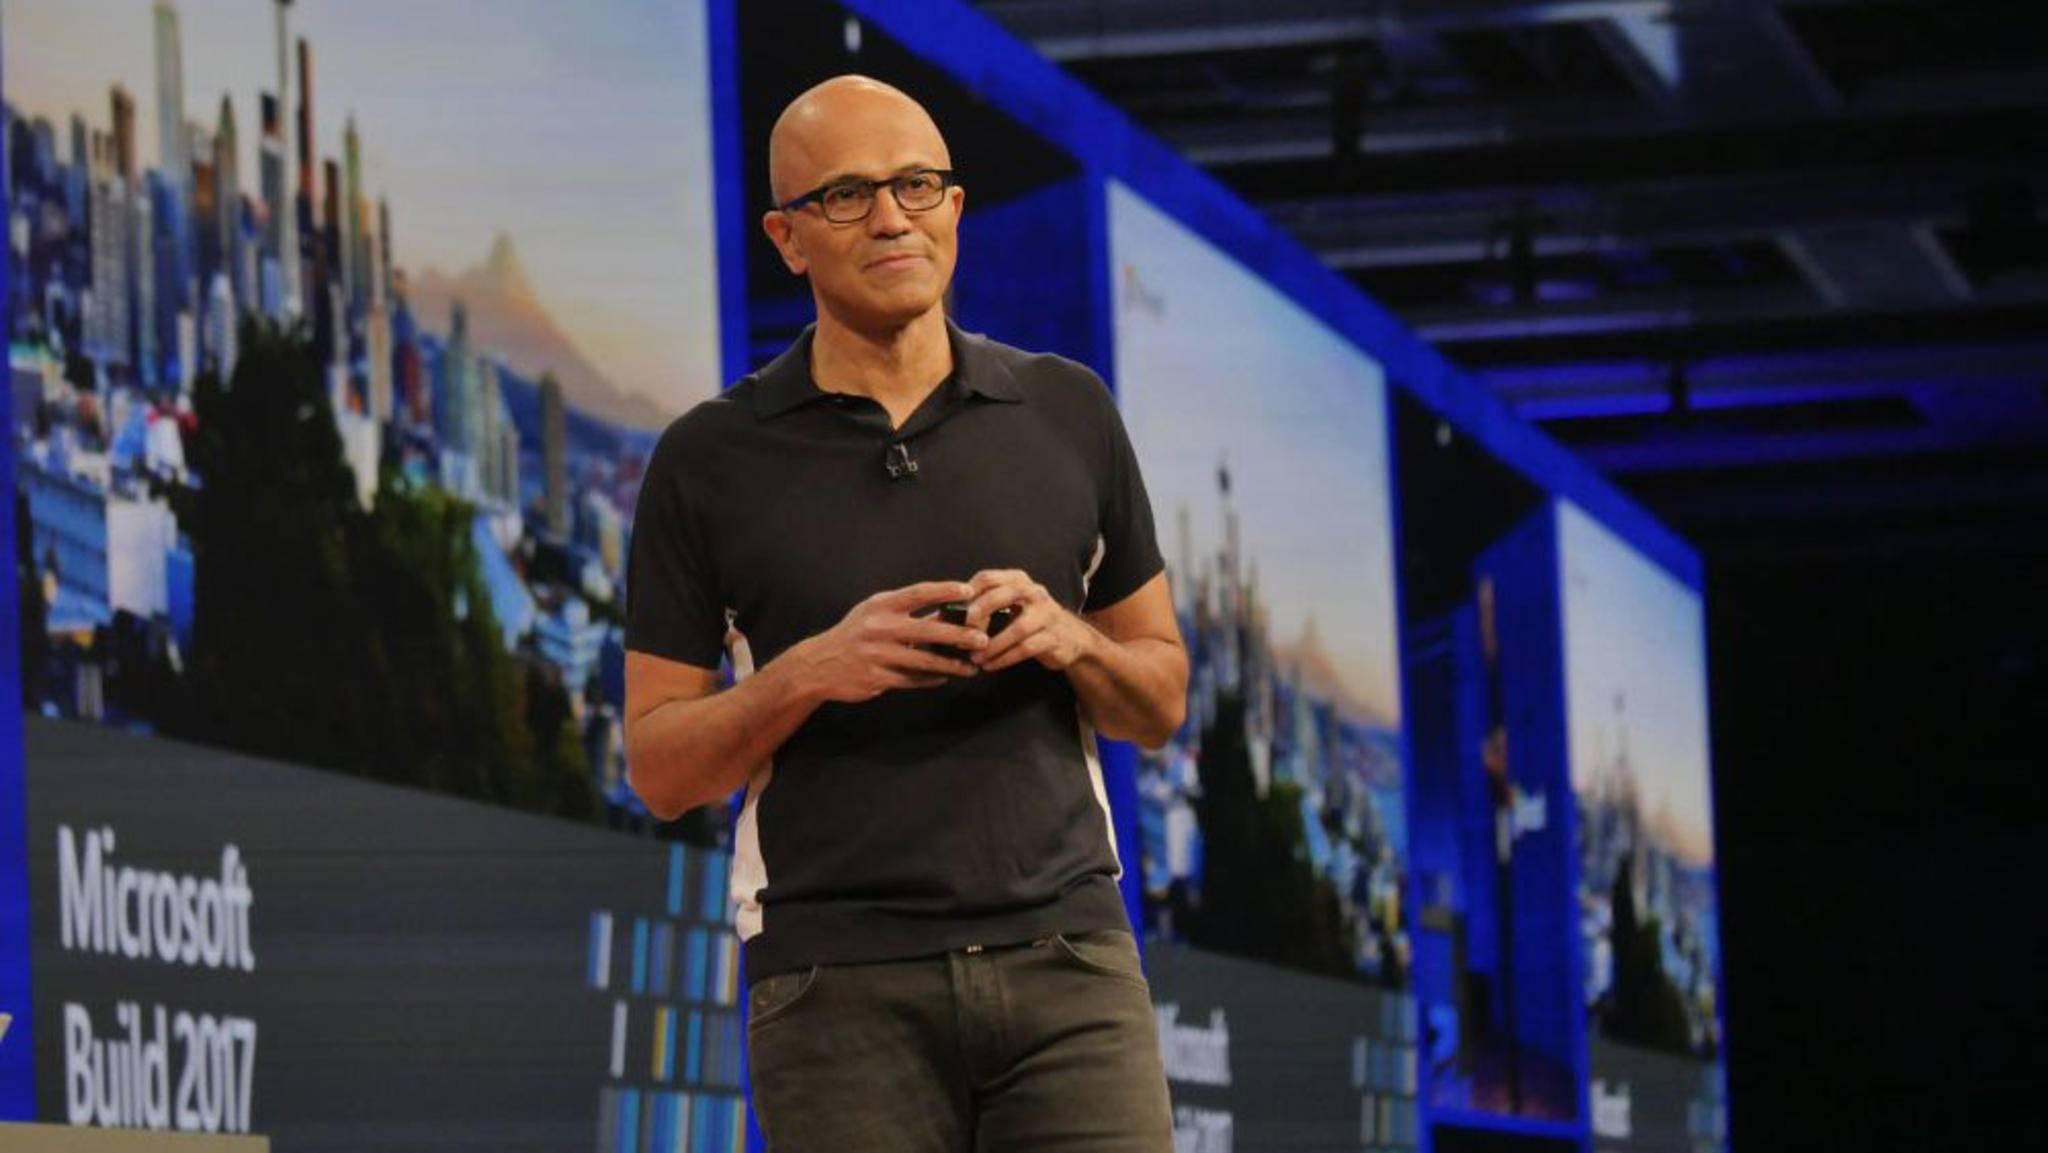 Microsoft-Boss Satya Nadella kündigt neue Windows 10-Features an.